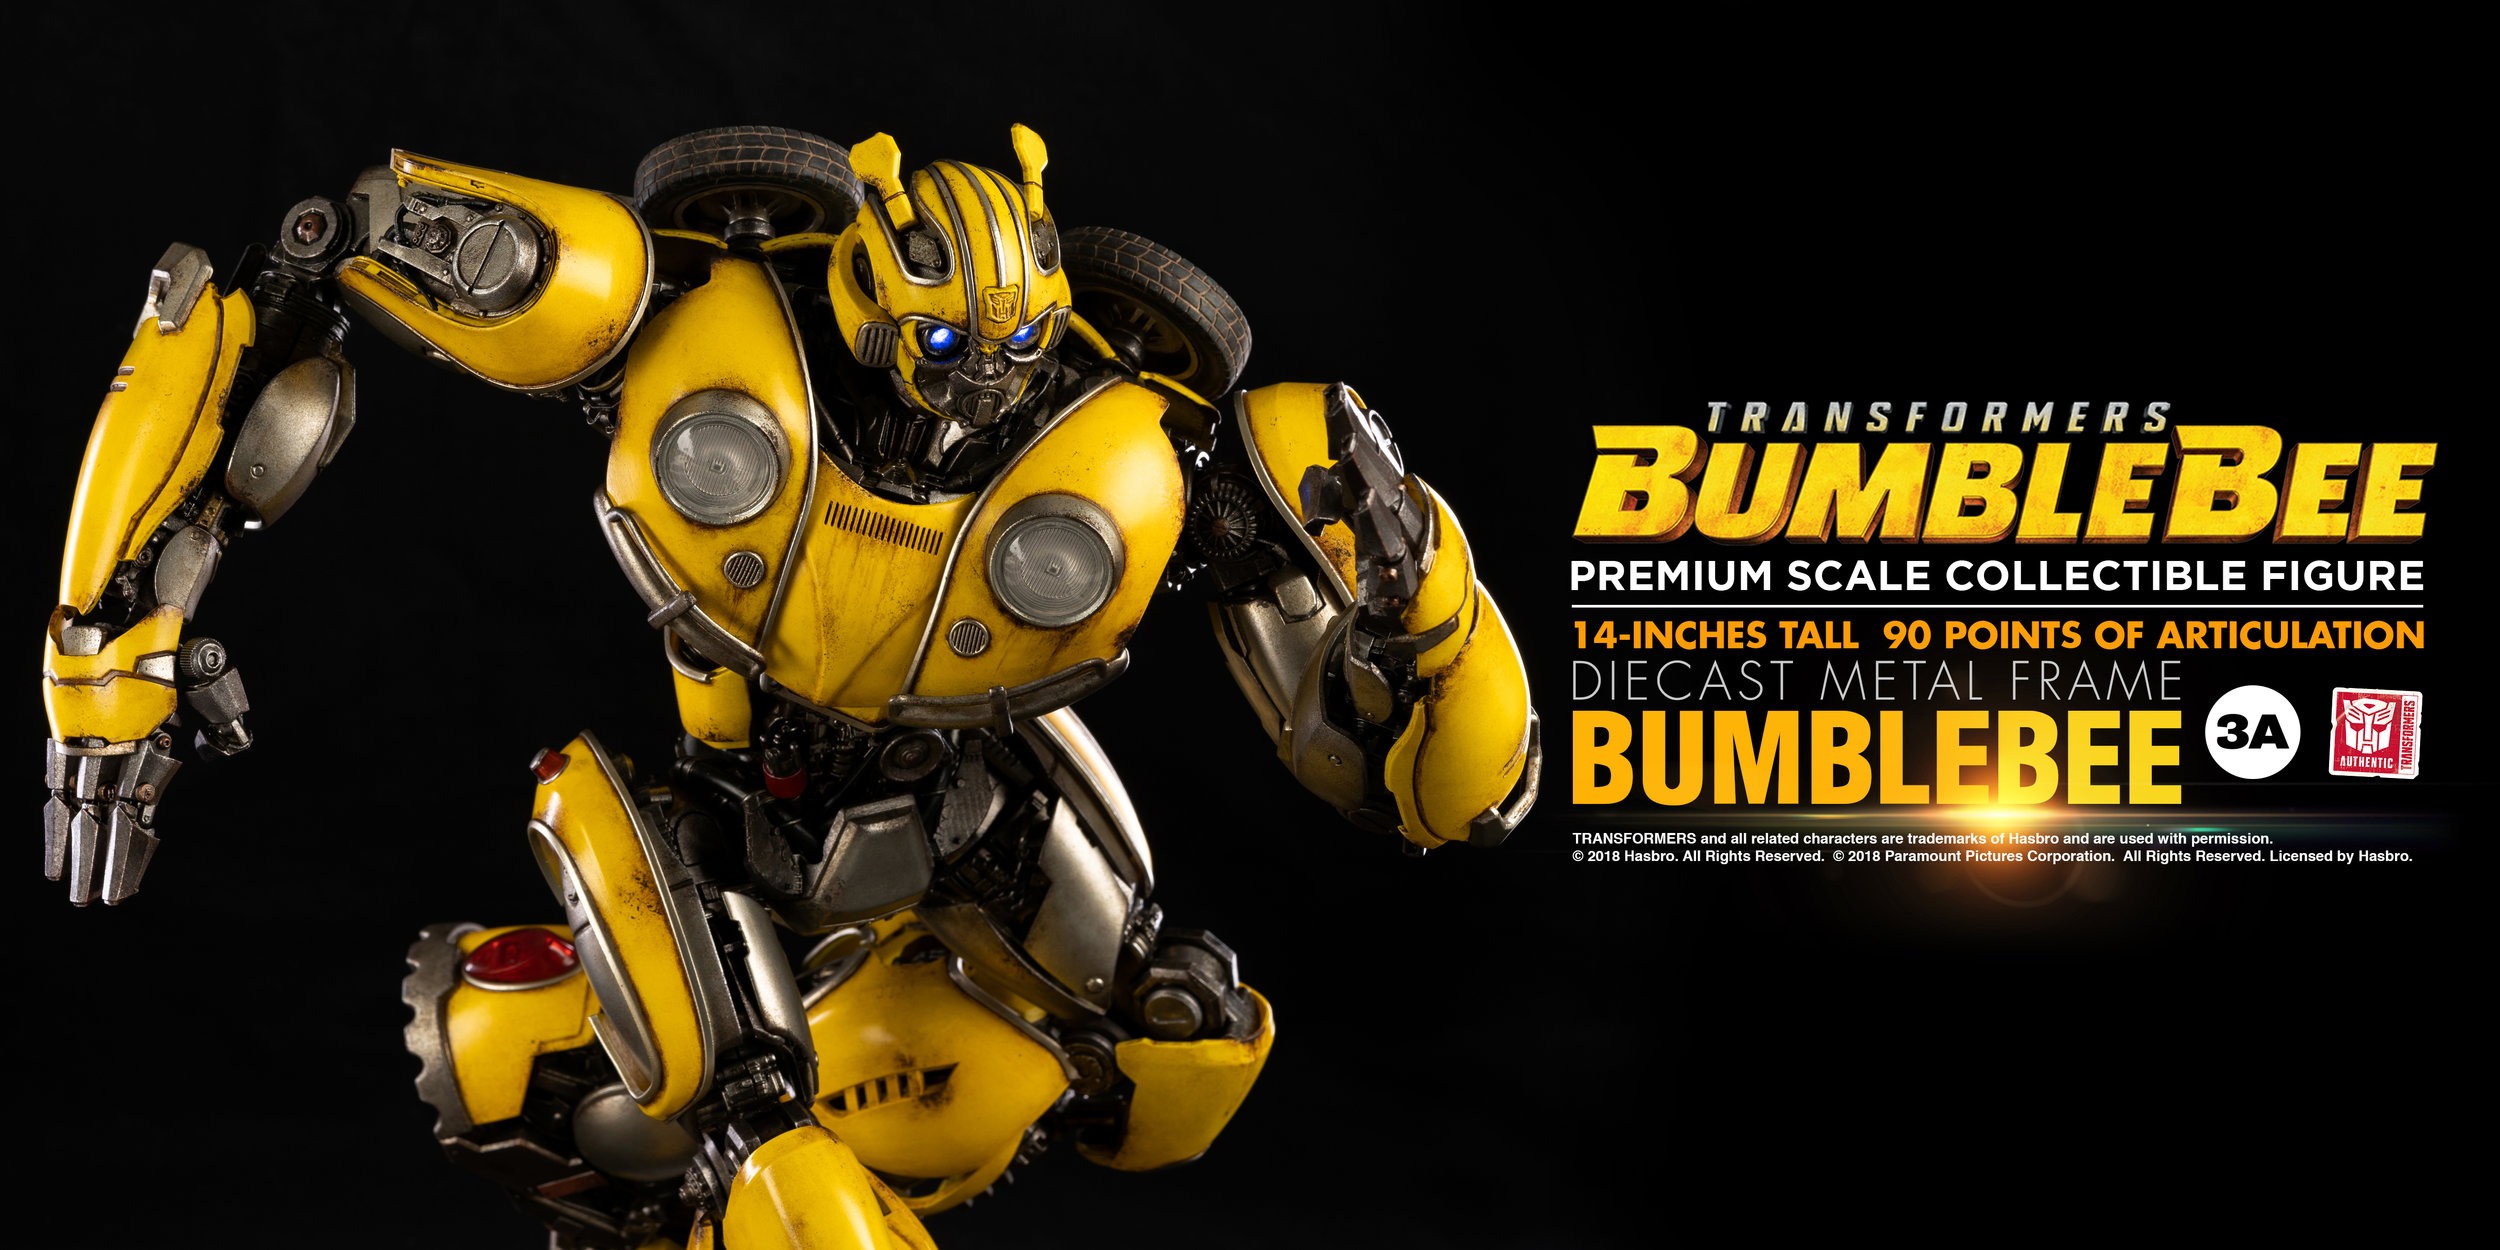 Bumblebee_ENG_PM_WIDE_002.jpg